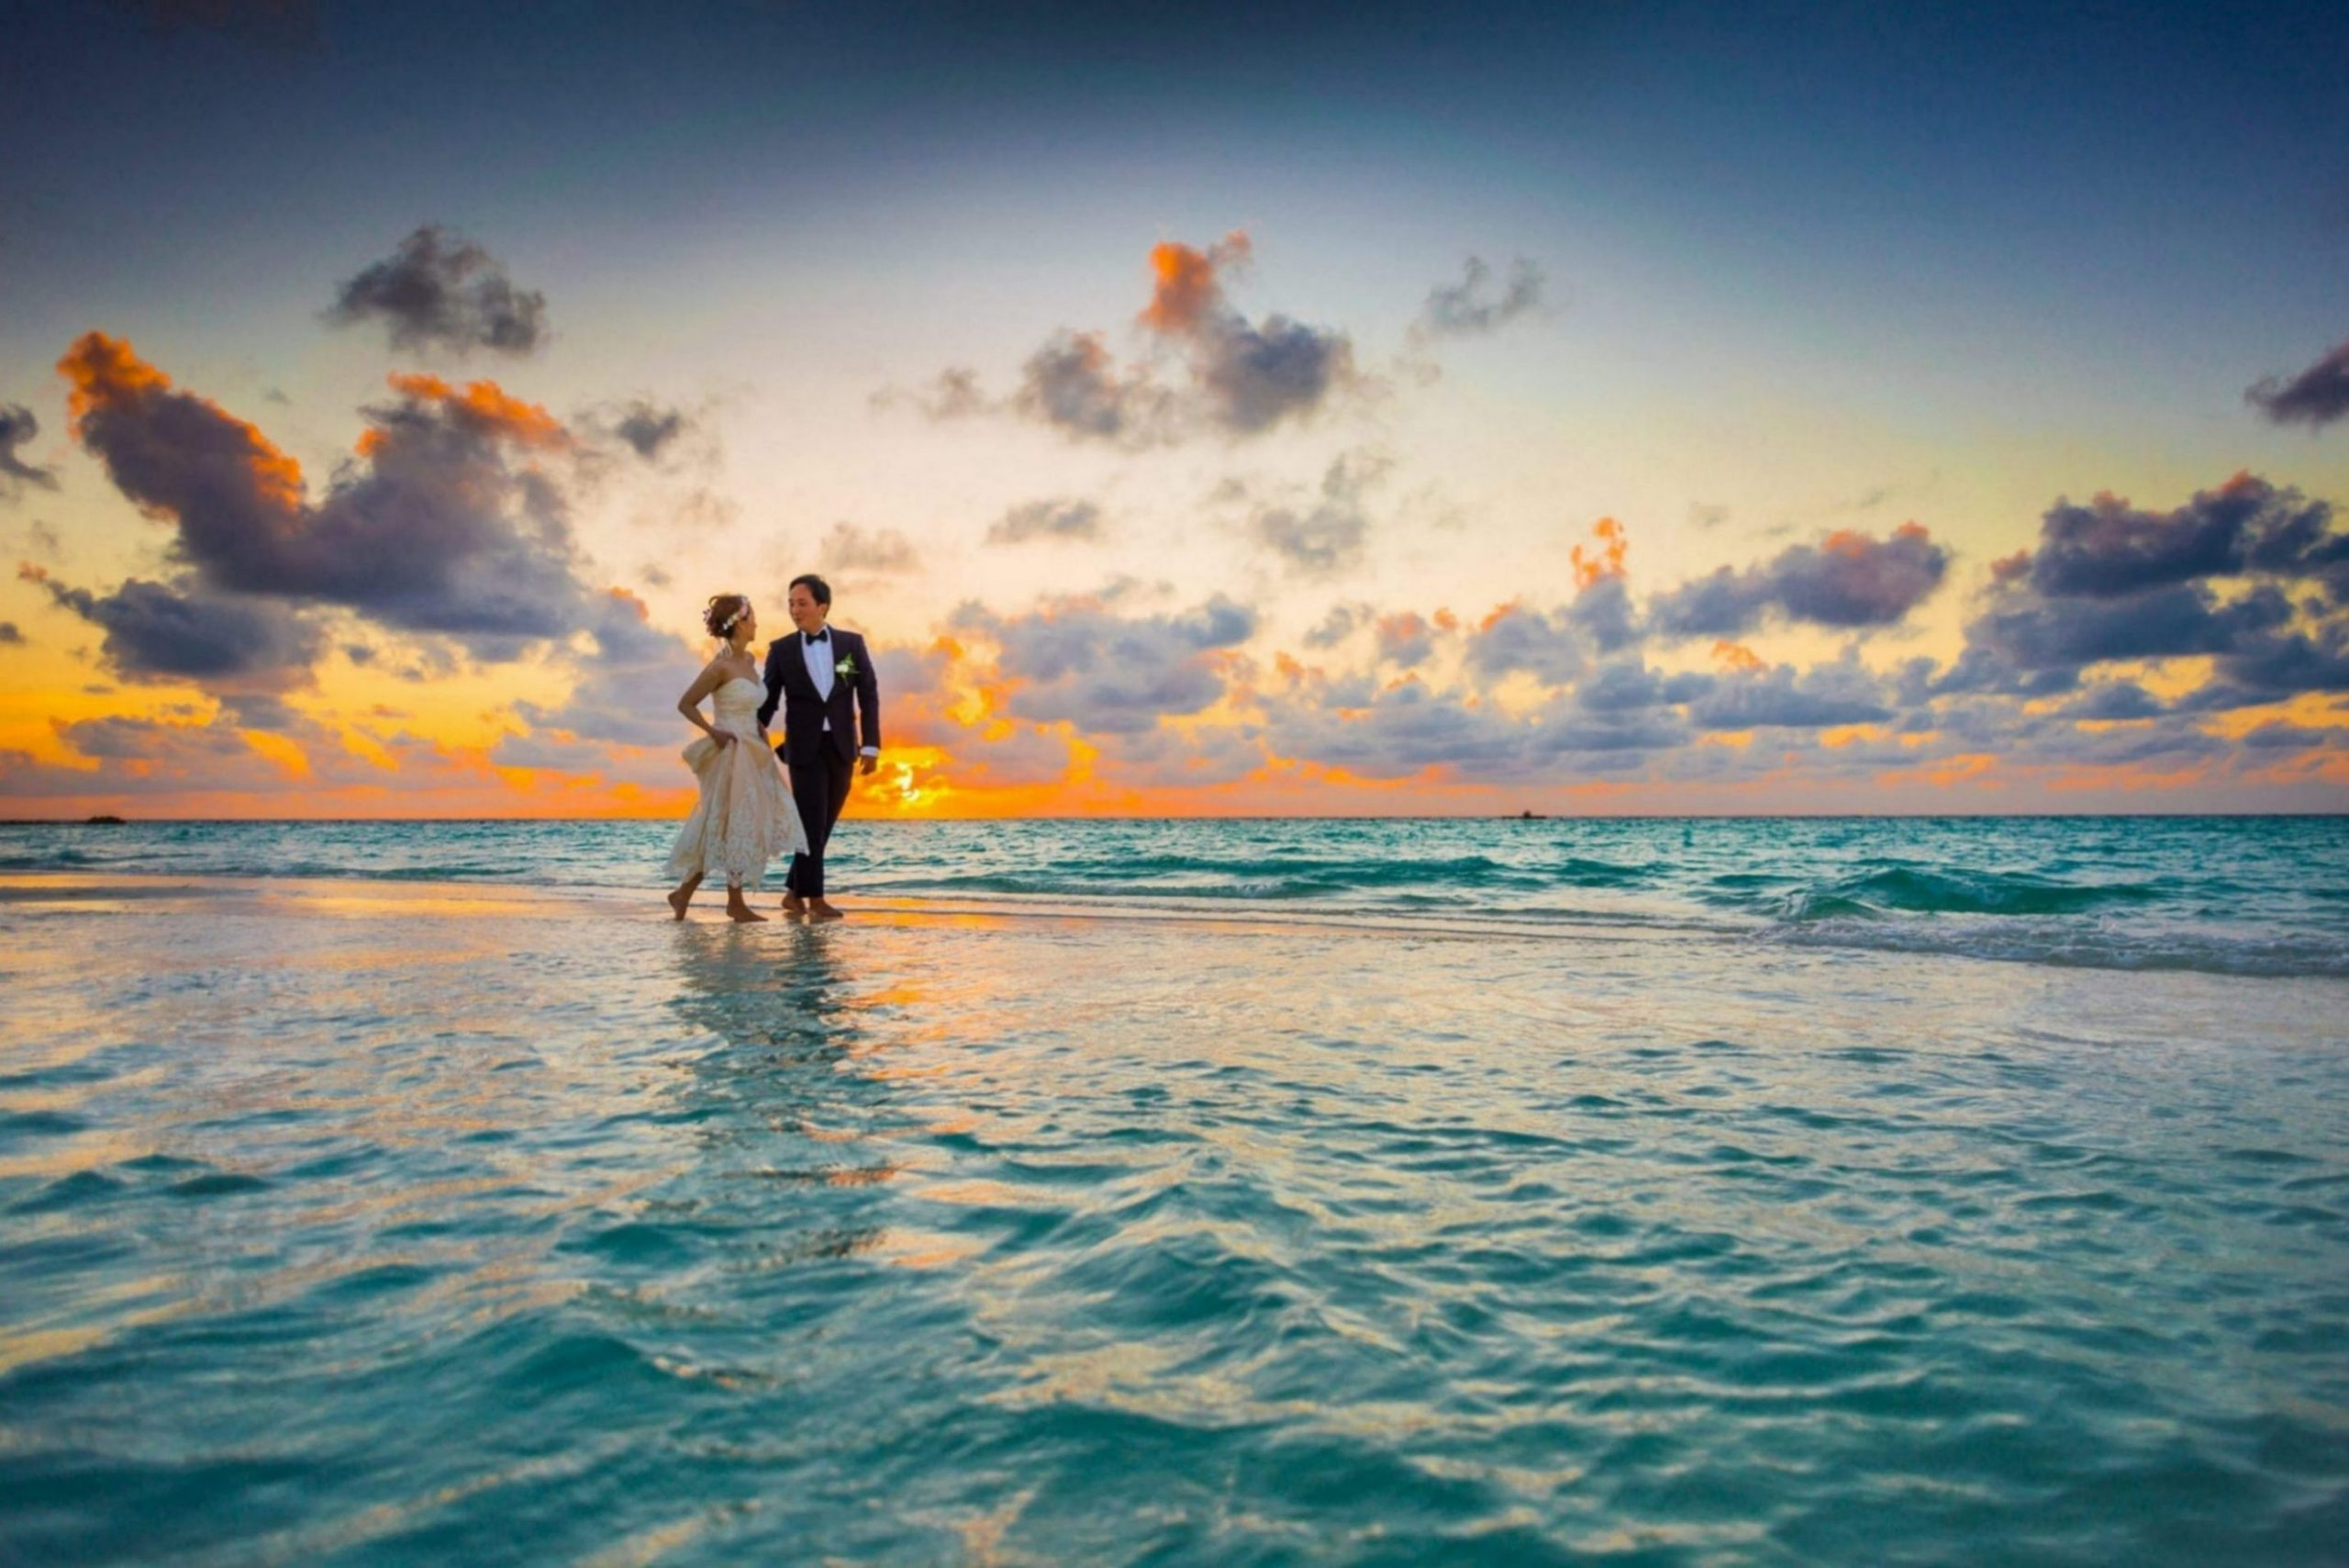 Newlyweds walking by the beach